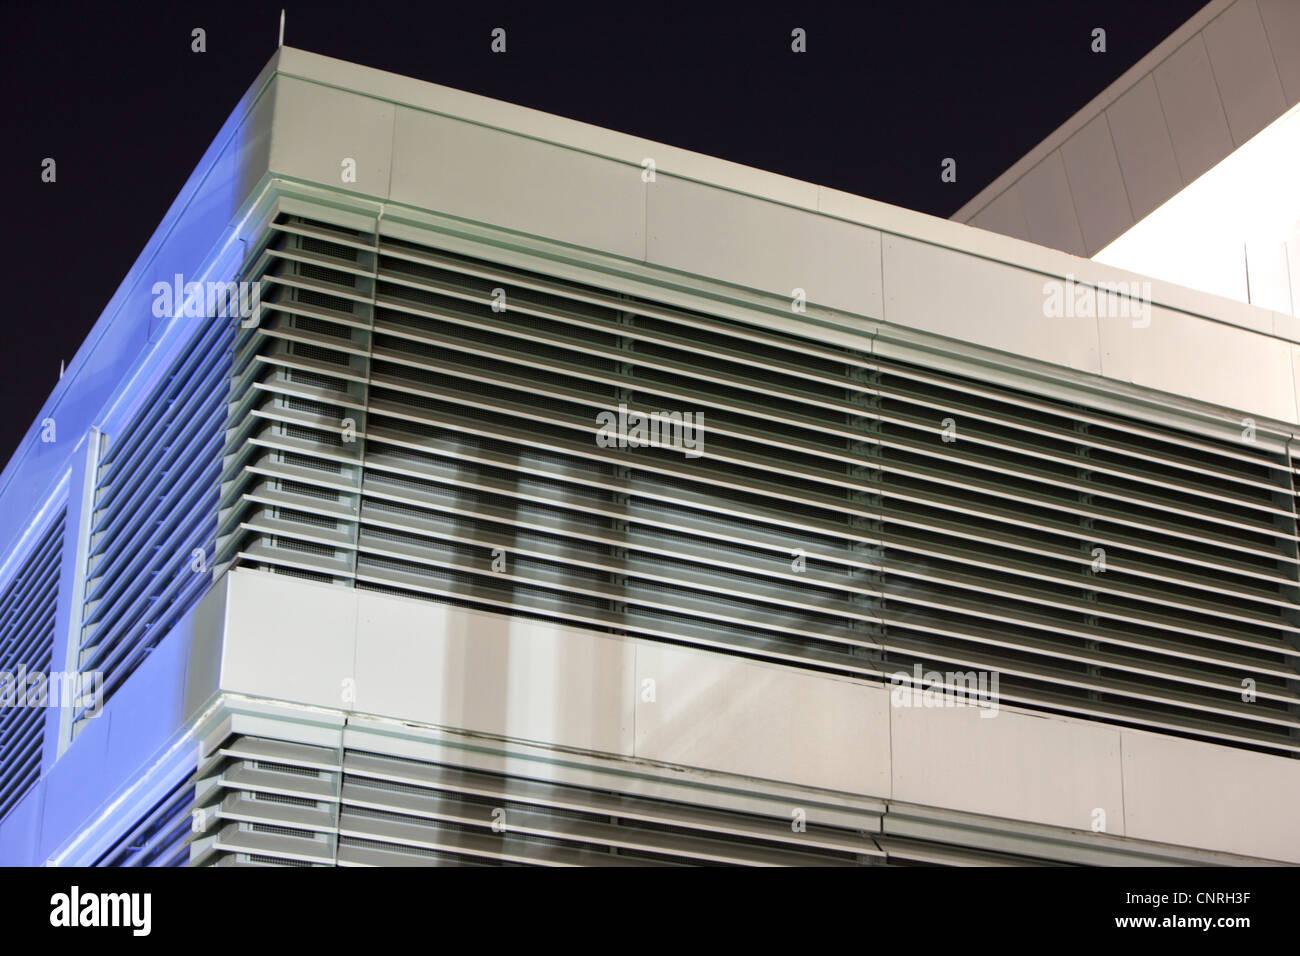 Building exterior - Stock Image